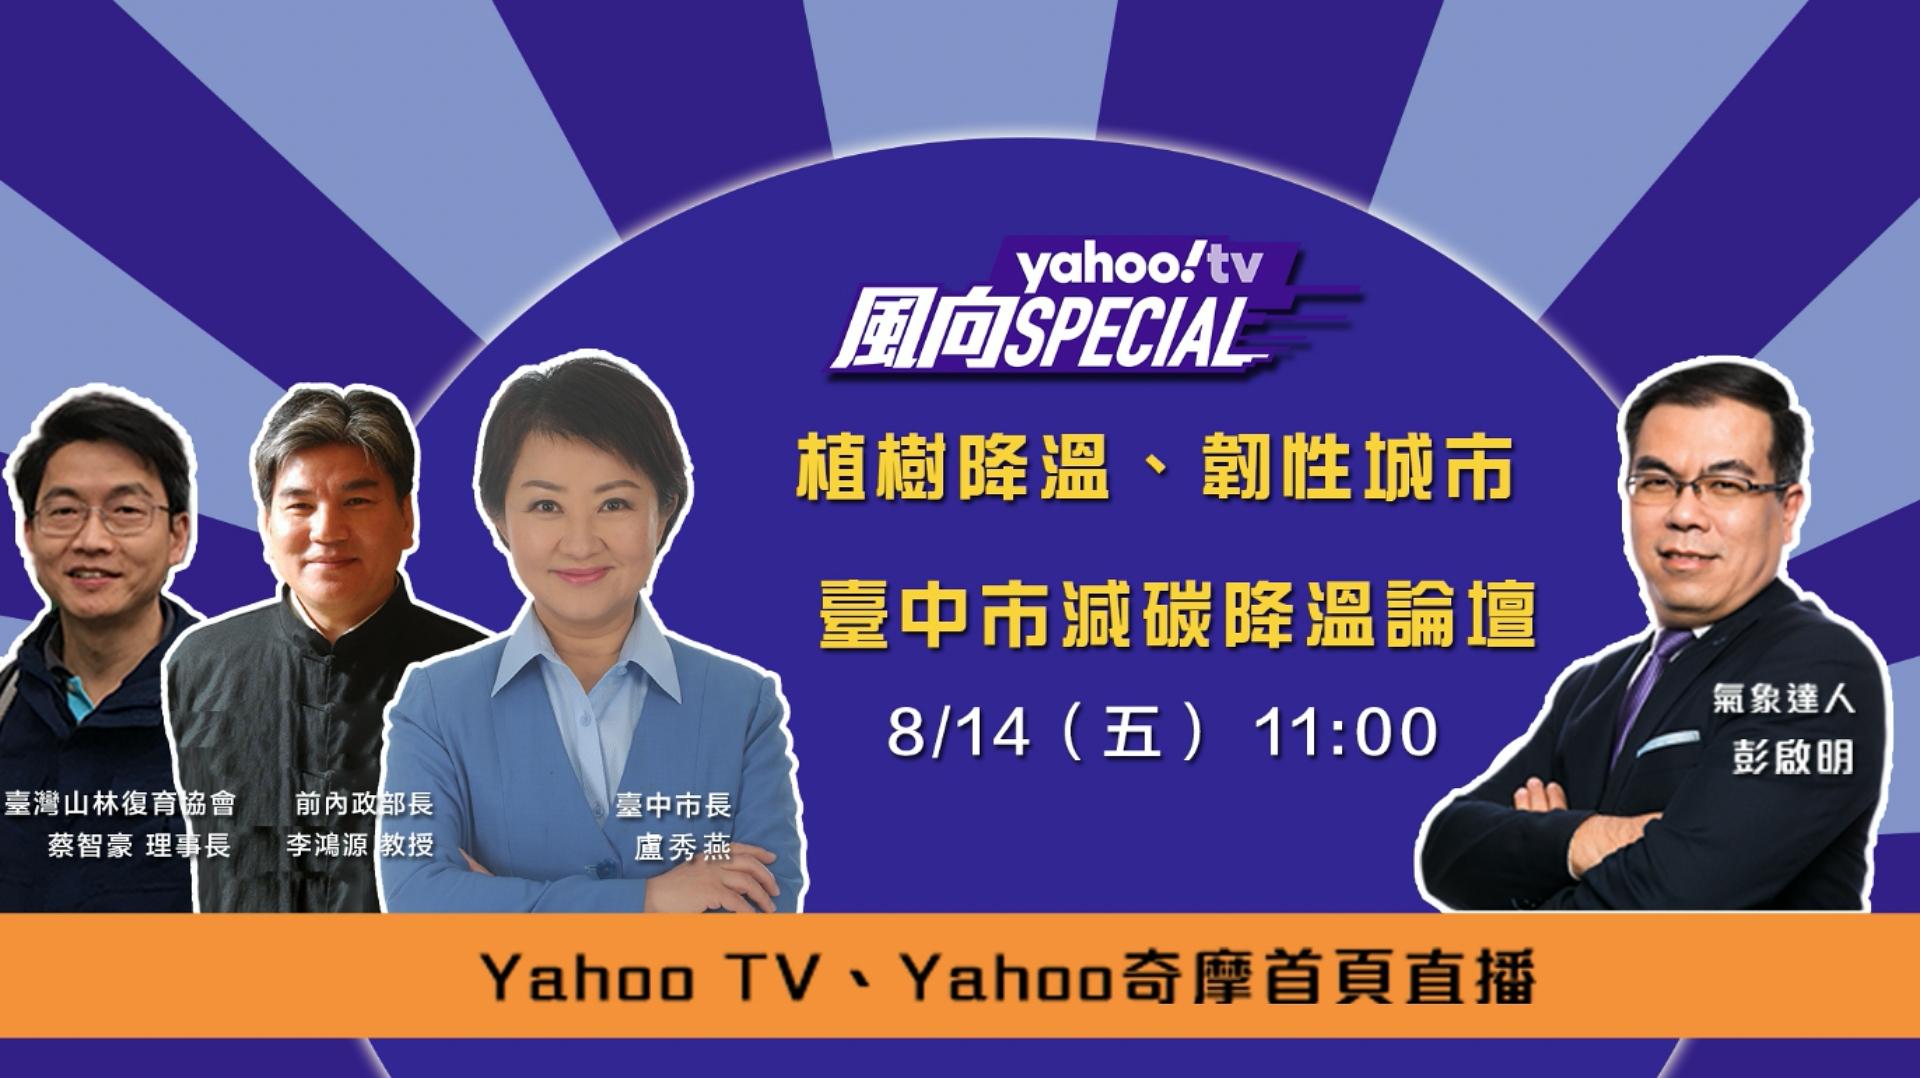 YahooTV 【風向Special】植樹降溫、韌性城市 臺中市減碳降溫論壇